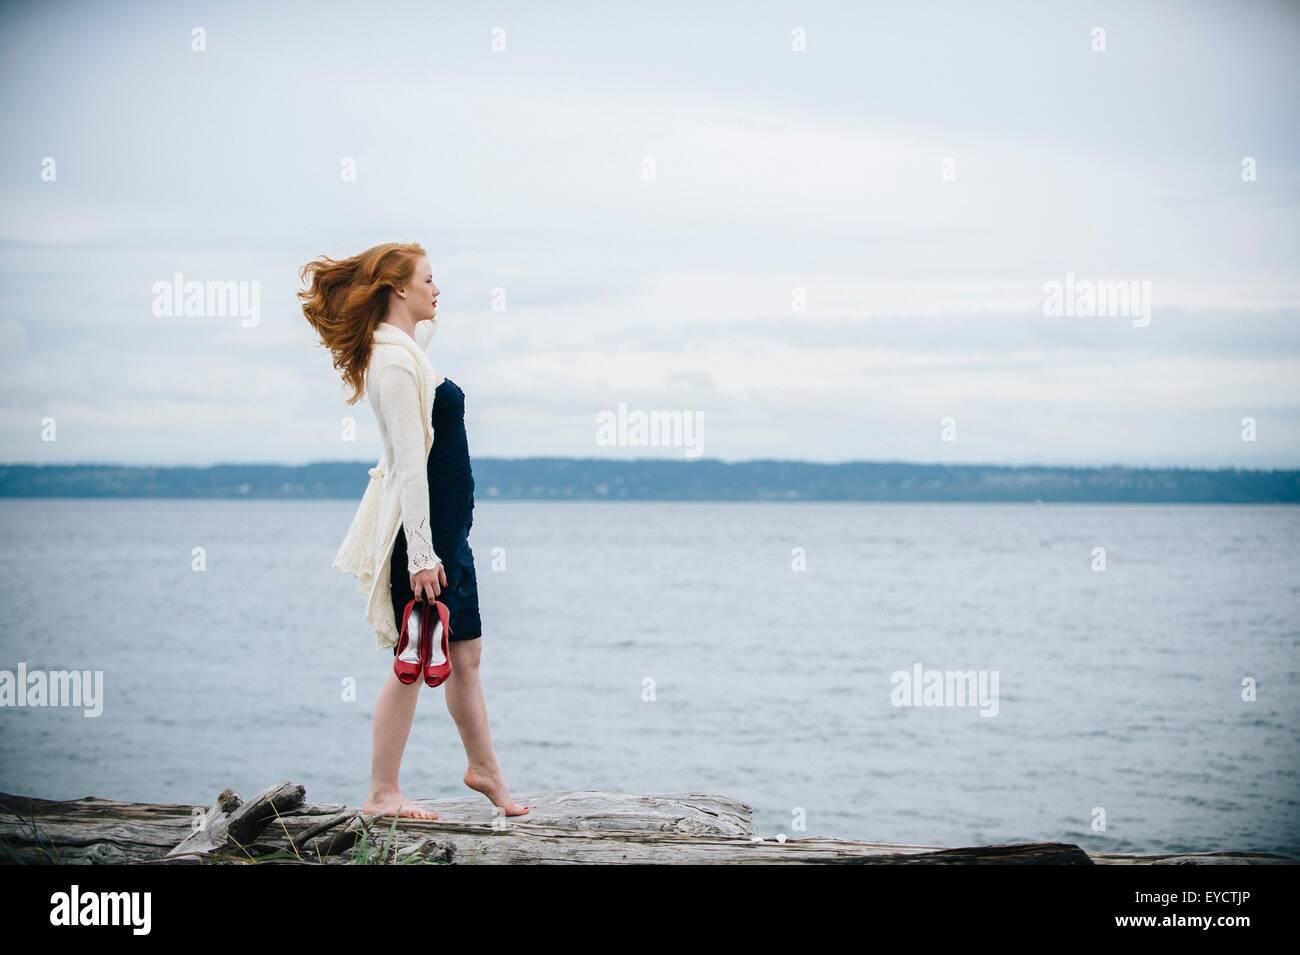 Jeune femme sur la plage face à la mer, Bainbridge Island, Washington State, USA Photo Stock